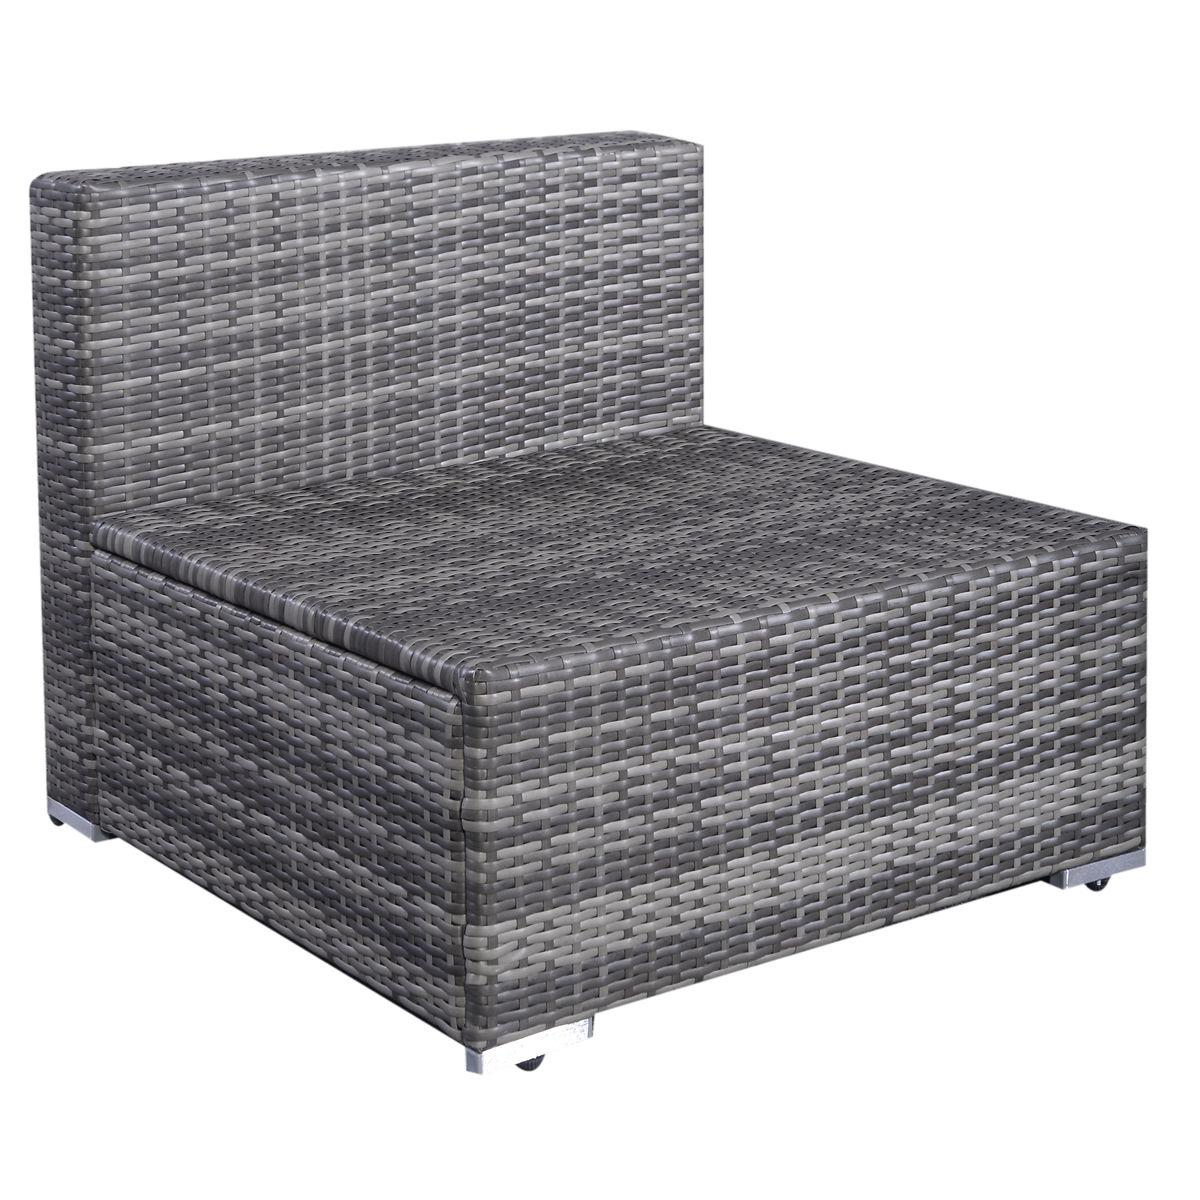 6 pcs Rattan Cushioned Sofa with Ottoman